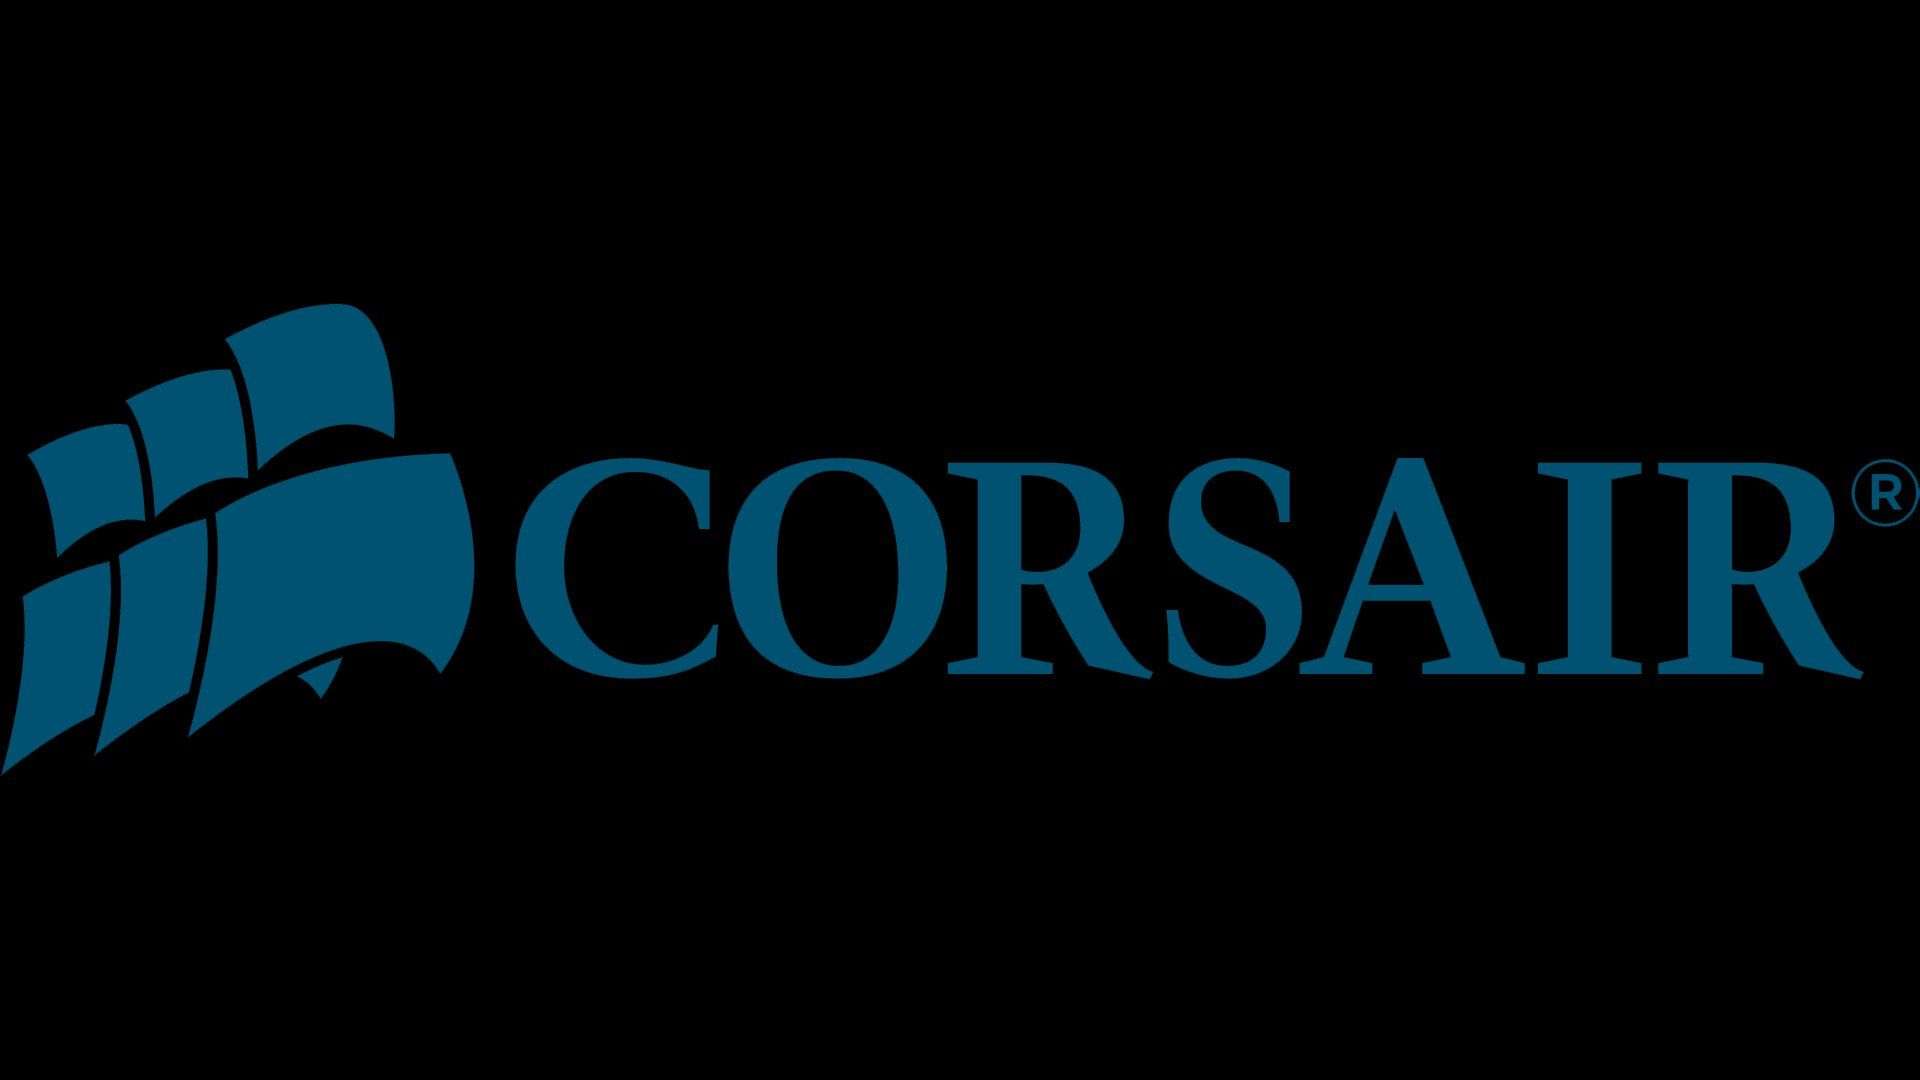 corsair background 1920x1080